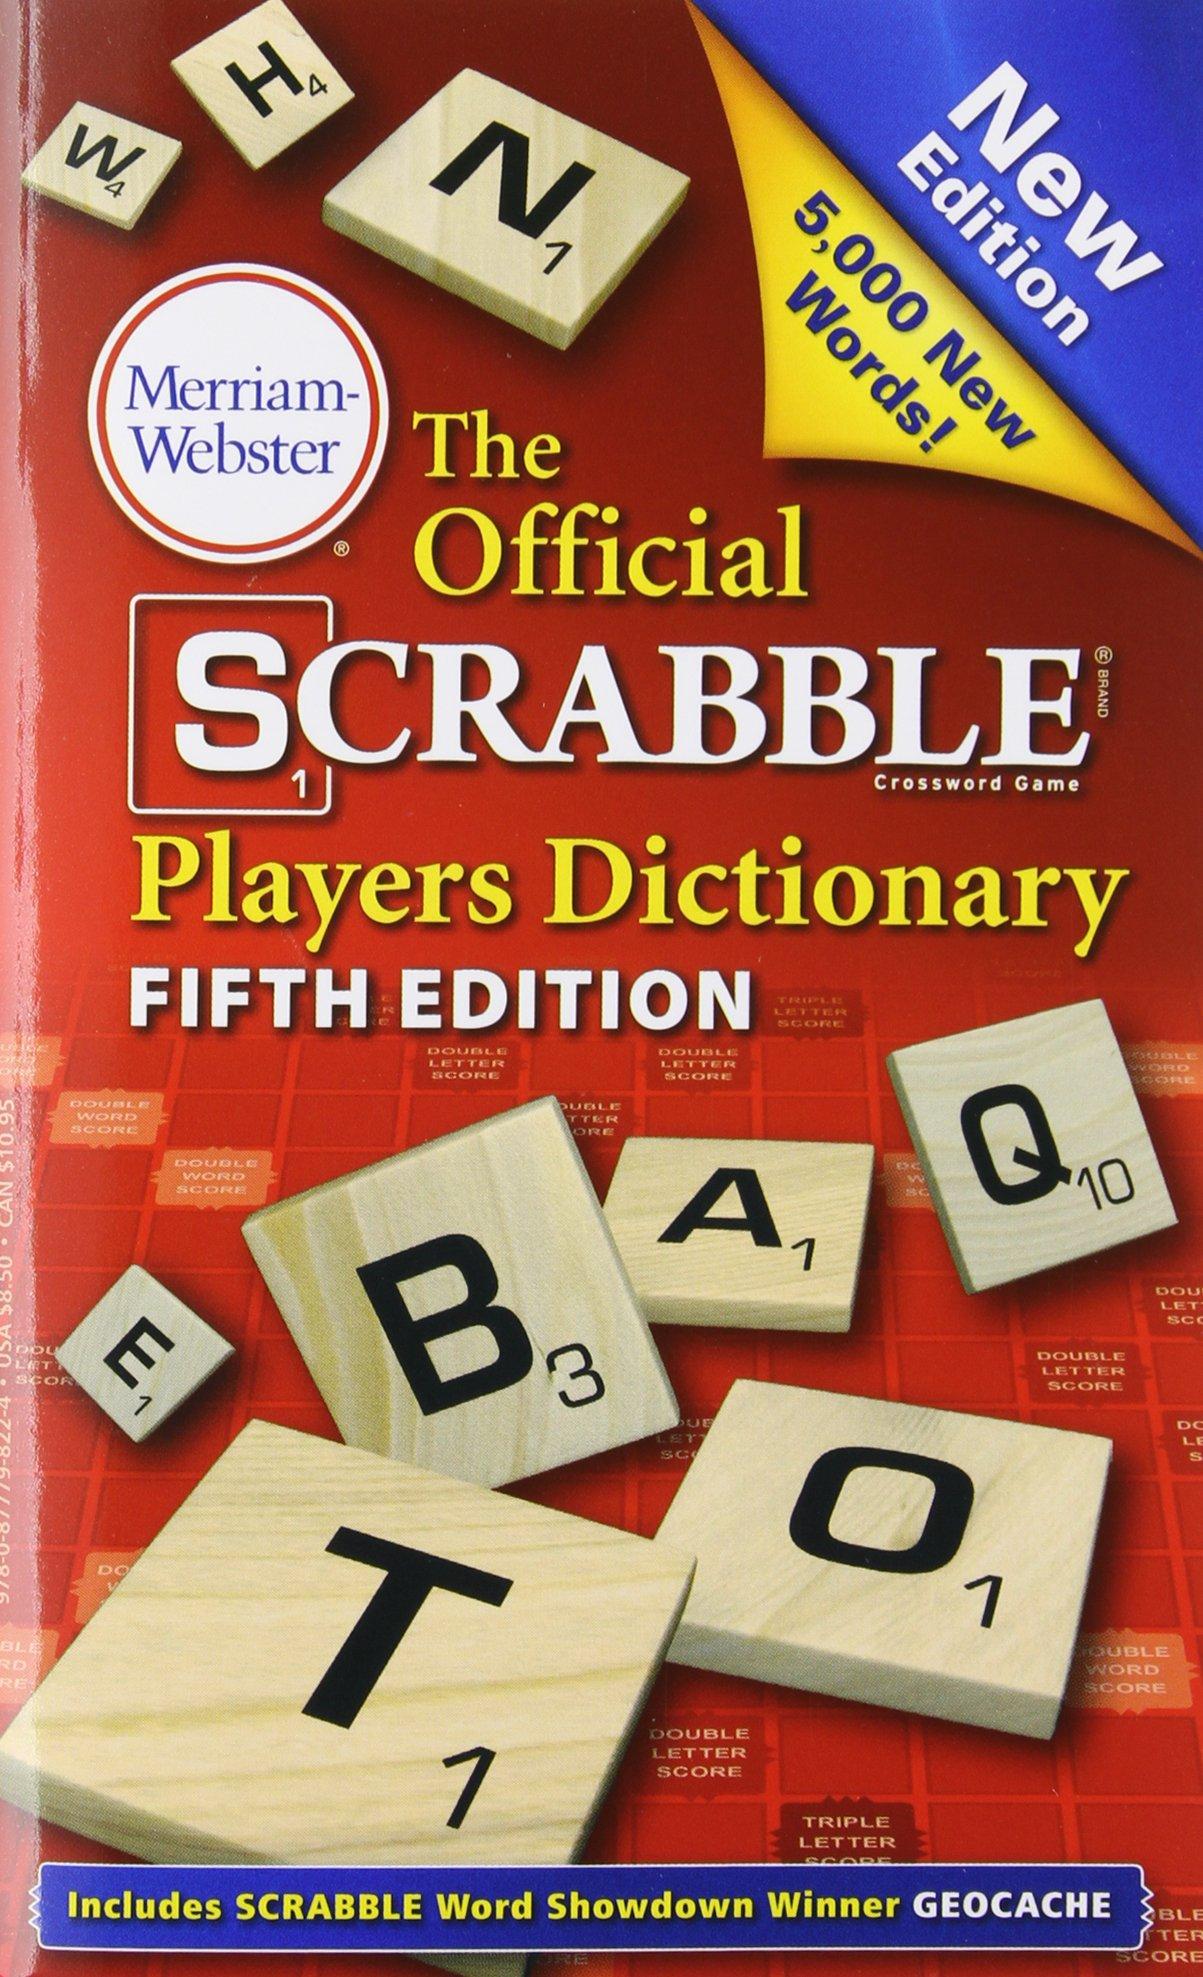 The Official Scrabble Players Dictionary, Fifth Edition: Amazon.es: Merriam-Webster: Libros en idiomas extranjeros